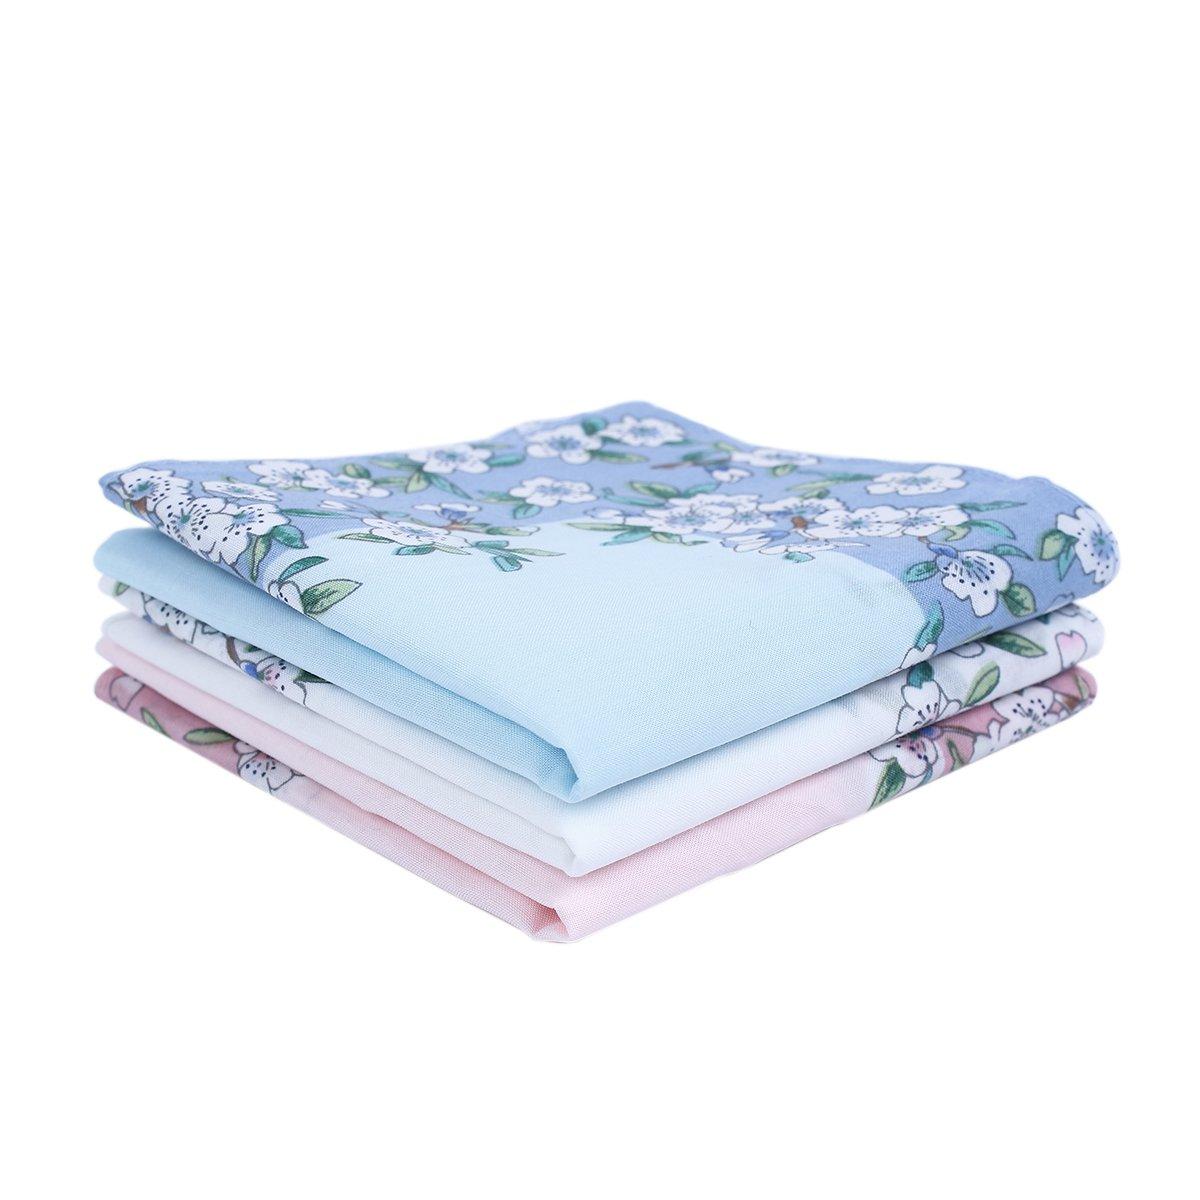 Houlife Women's 100% Cotton Cherry Blossom Floral Print Handkerchief 3 Pieces